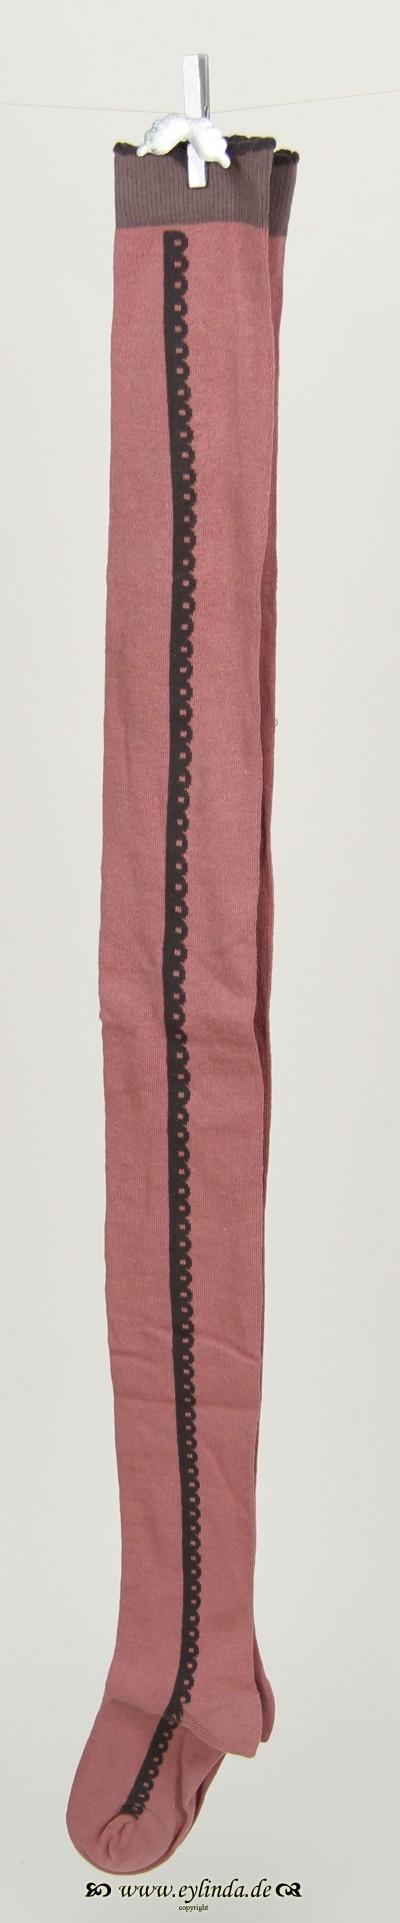 Strumpfhose, Couture Hosiery, pigment